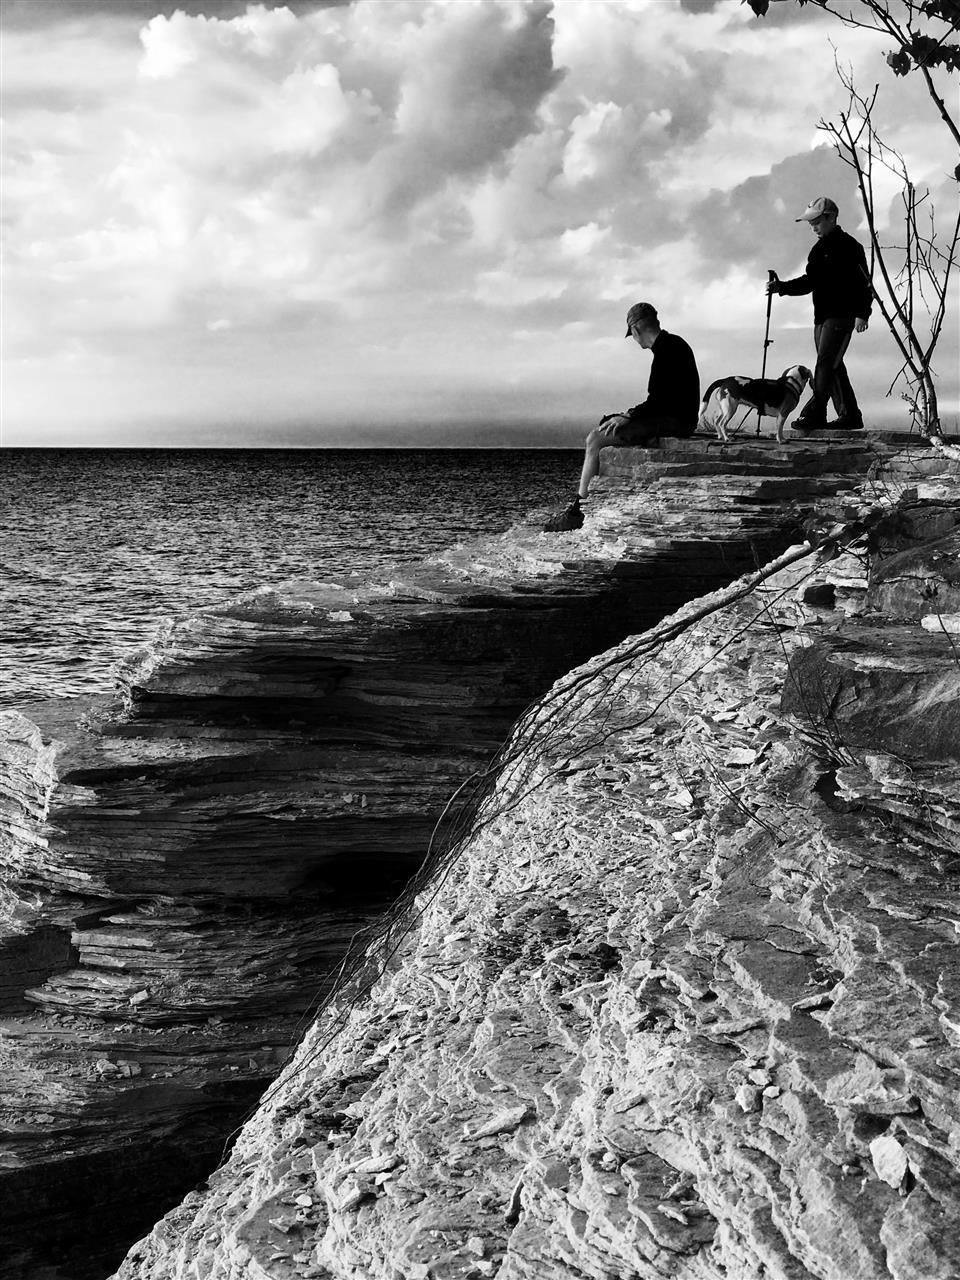 Нарисованные скалы, Лаура Джойс-Хаббард / Laura Joyce-Hubbard, Хайленд-Парк, Иллинойс, Фотоконкурс Santa Fe Photographic